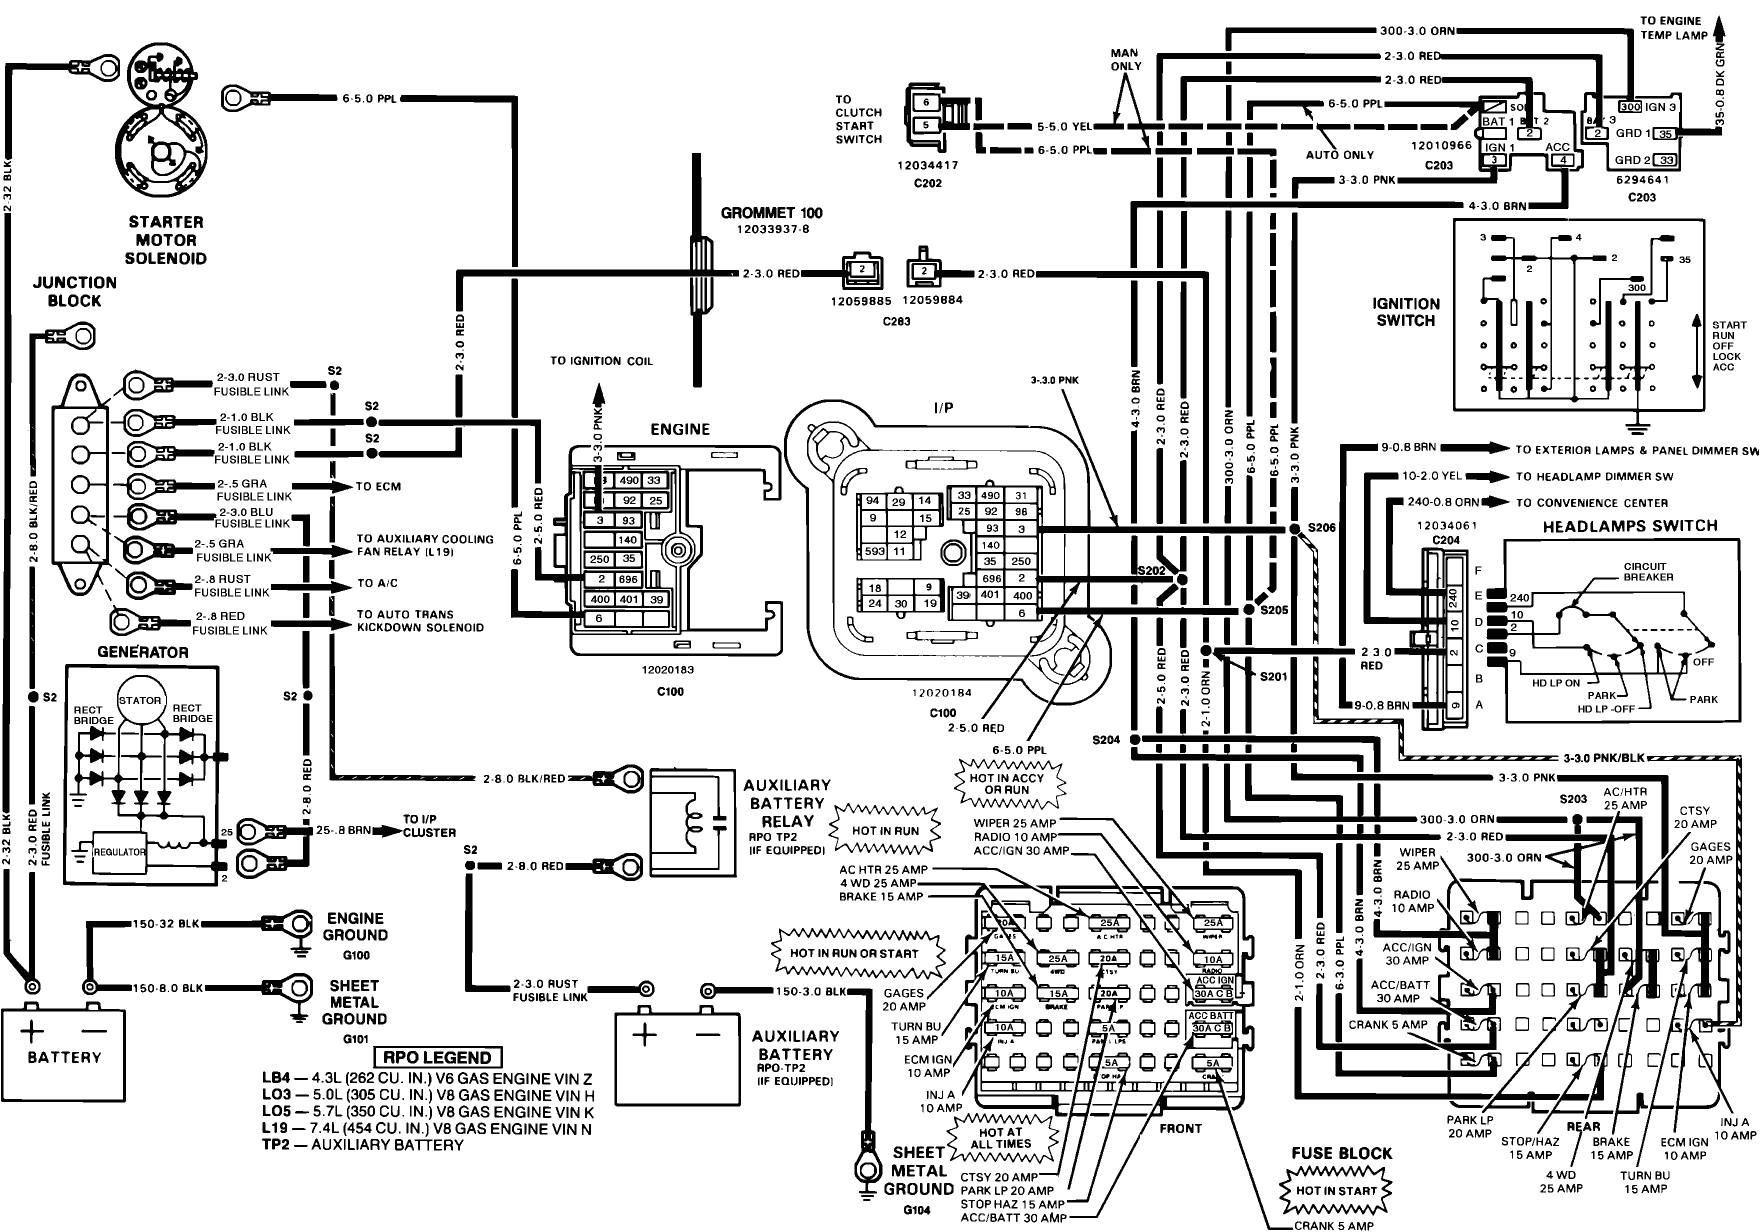 2002 gmc sierra headlight wiring wiring diagram operations wiring headlight 2002 gmc 1500